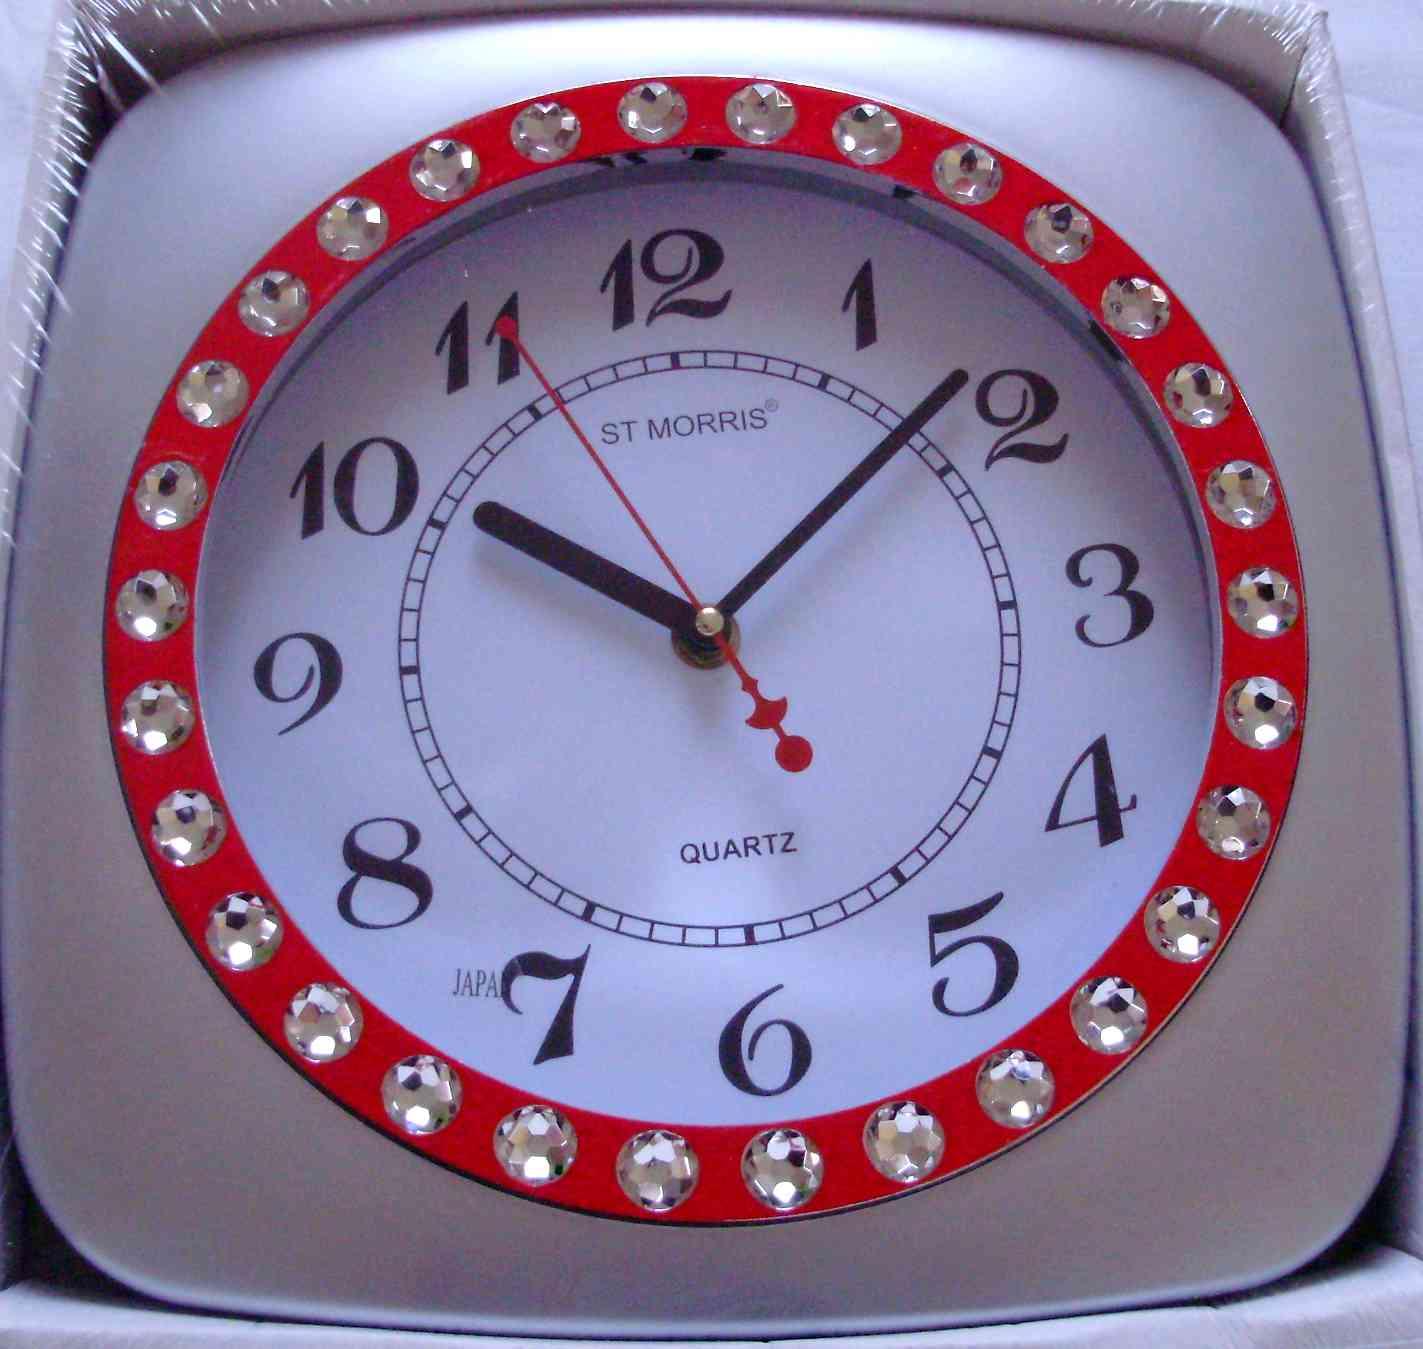 Comercial rodkar reloj de pared - Reloj de pared diseno ...